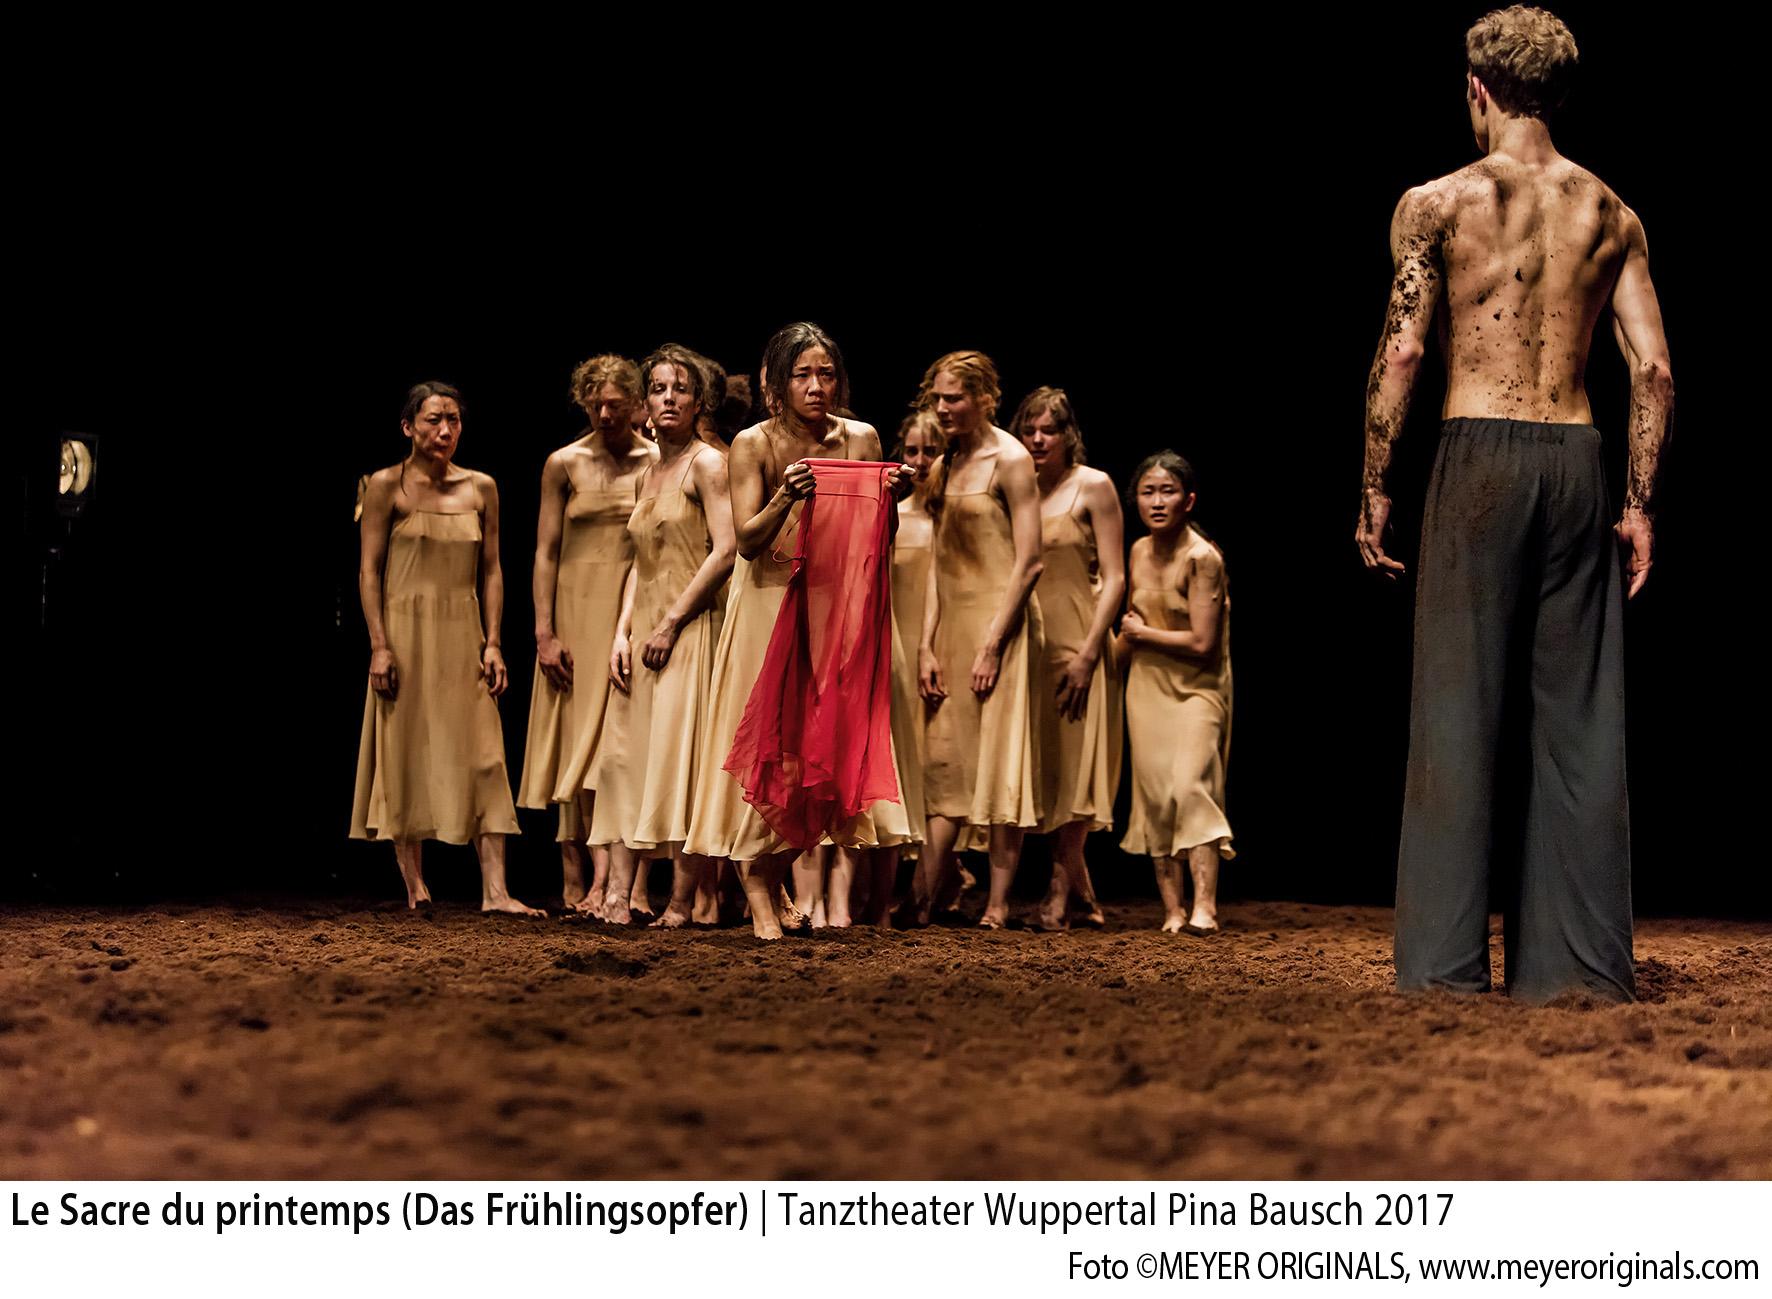 Wuppertal Pressebilder Das Frühlingsopfer 2017 Meyer_Originals 4